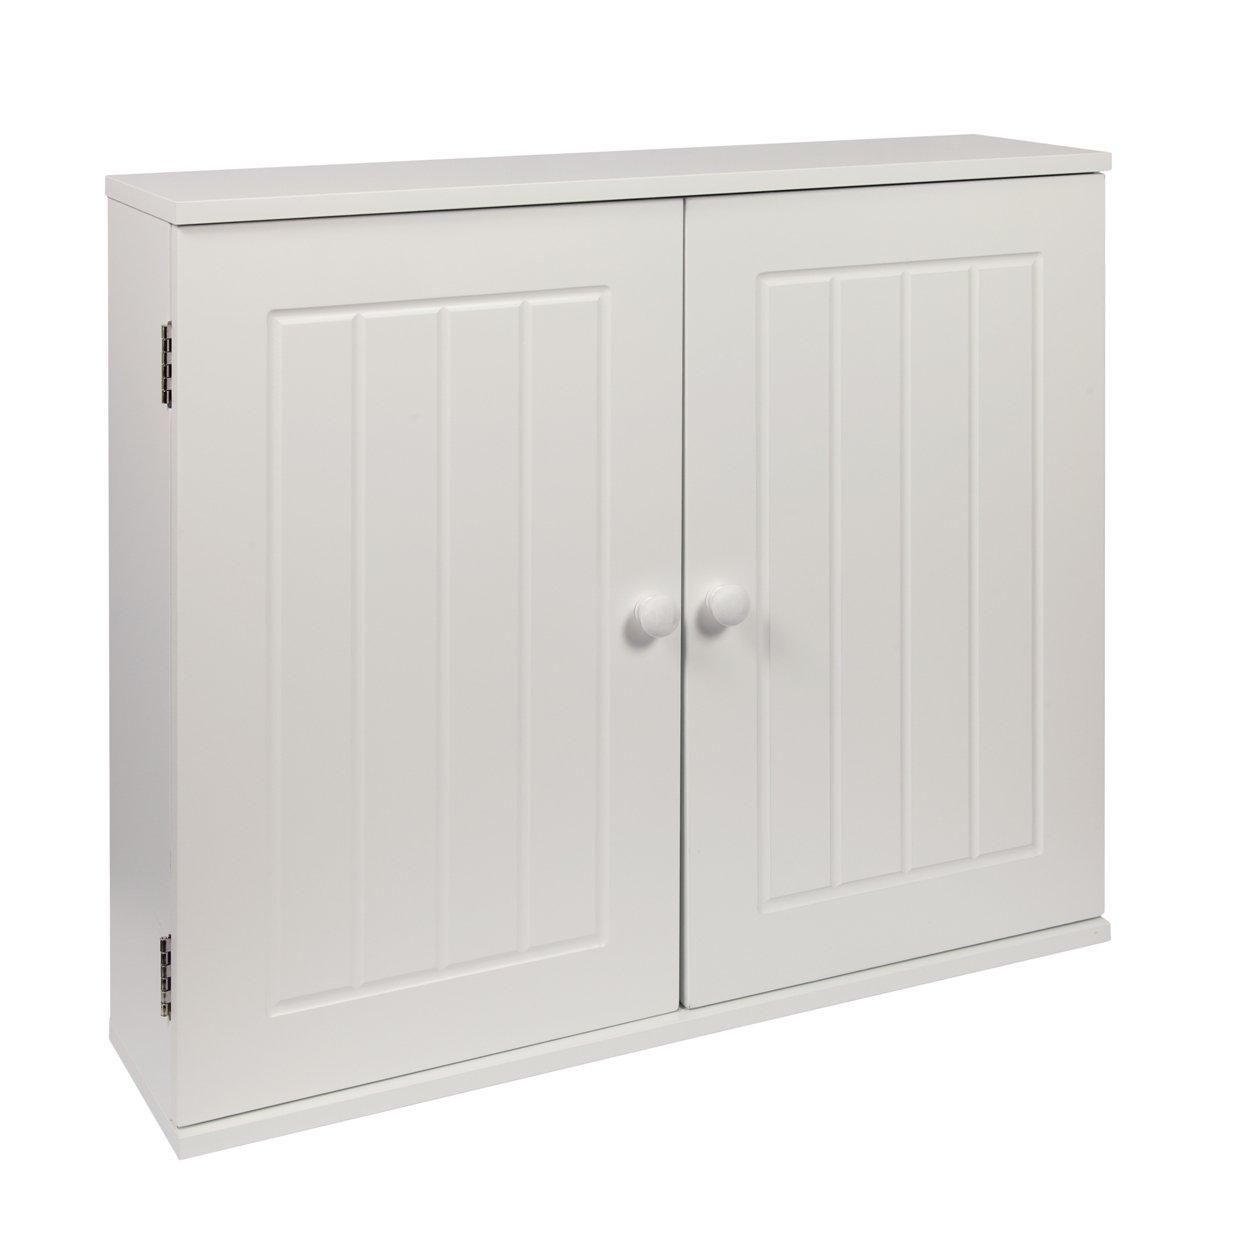 white storage cupboard amazon co uk rh amazon co uk small white shoe storage cabinet small white shoe storage cabinet